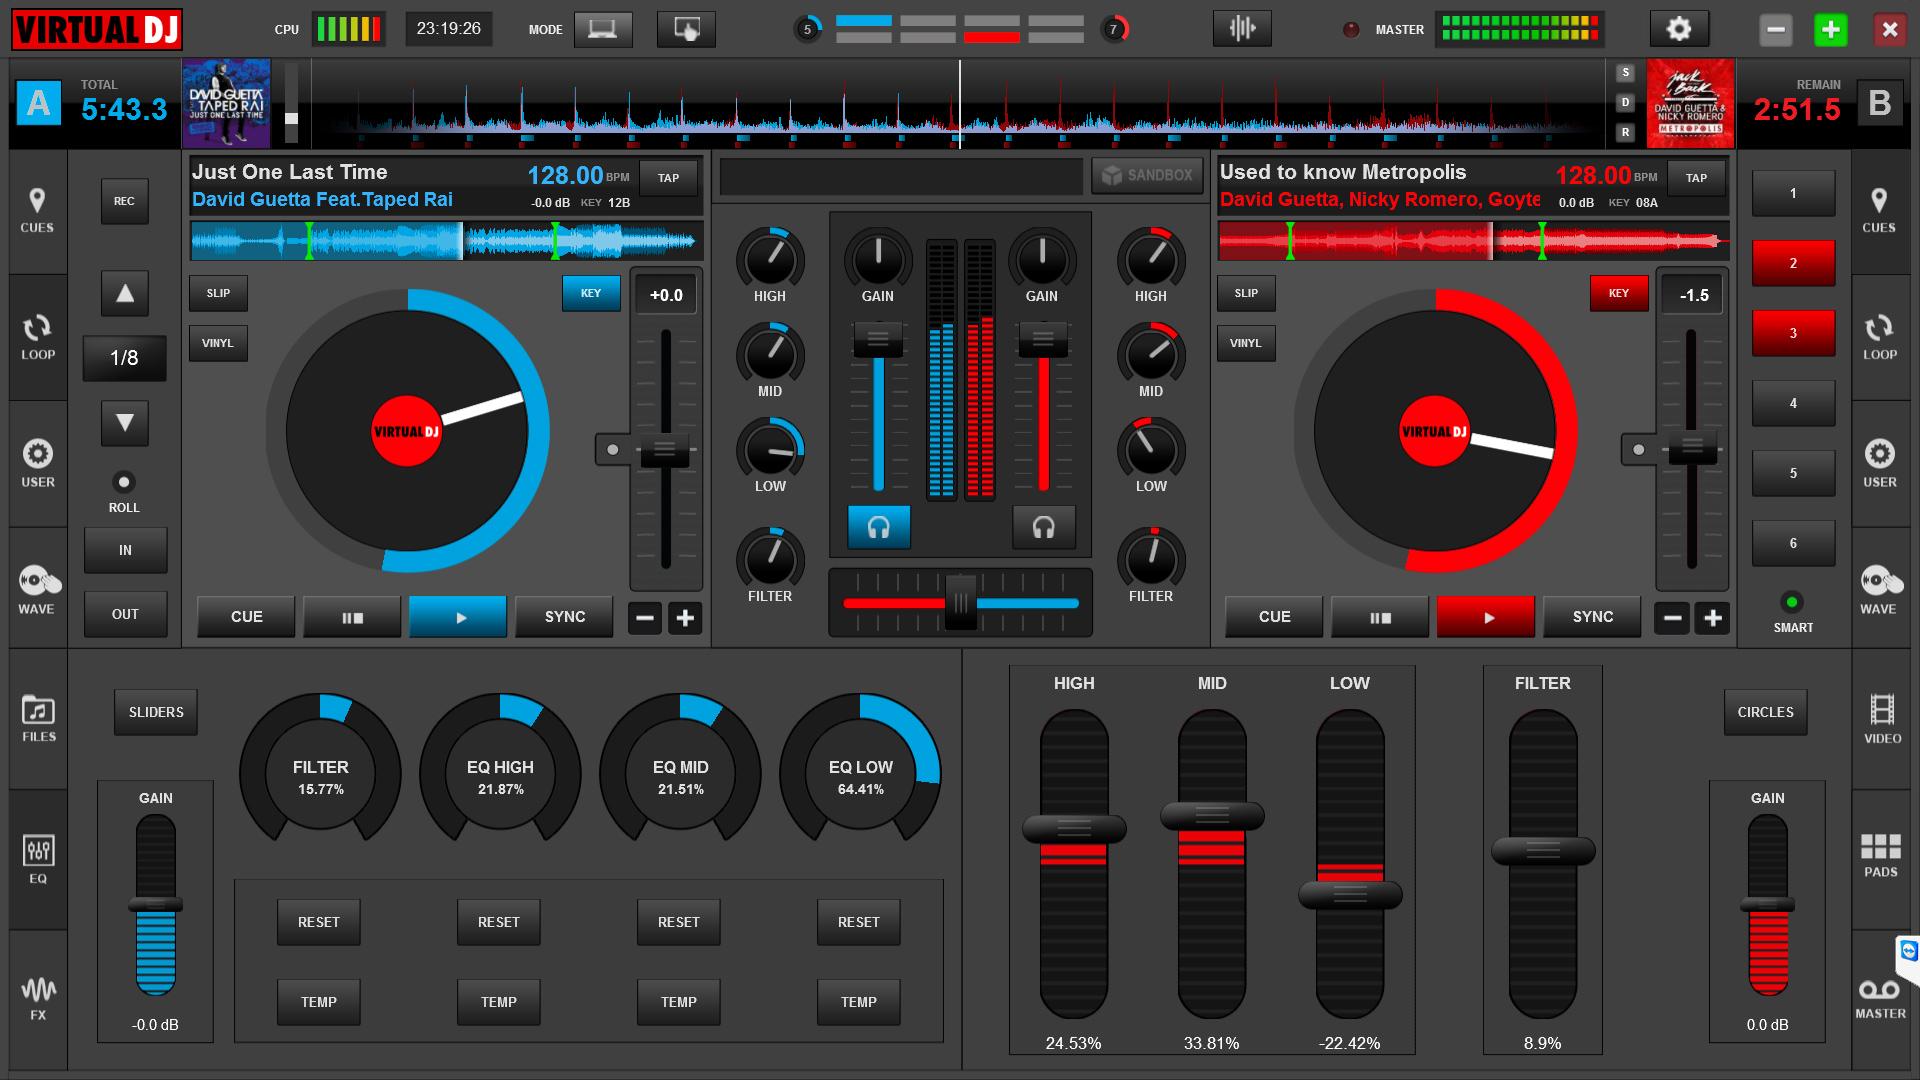 VirtualDJ – Ask The DJ Might End The Request Debate | Mp3poolonline com